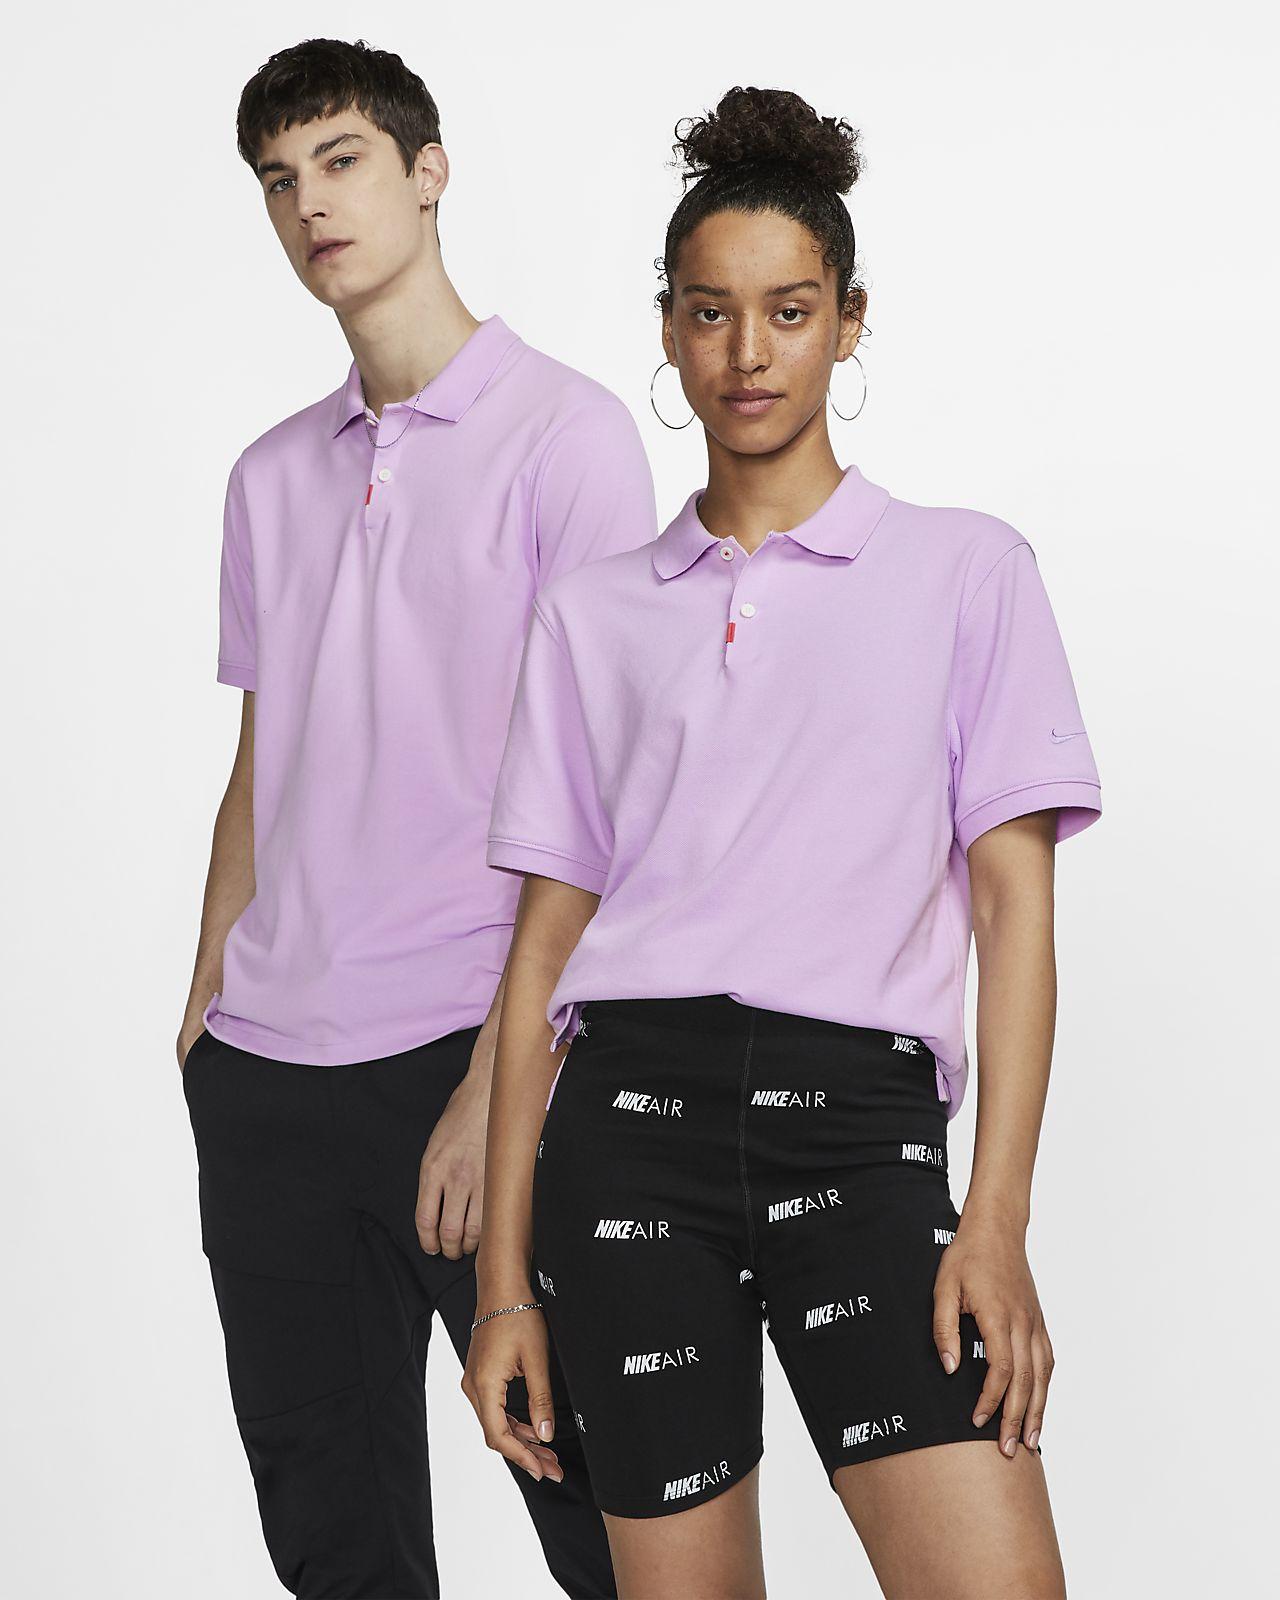 The Nike Polo-unisex polo med slank pasform